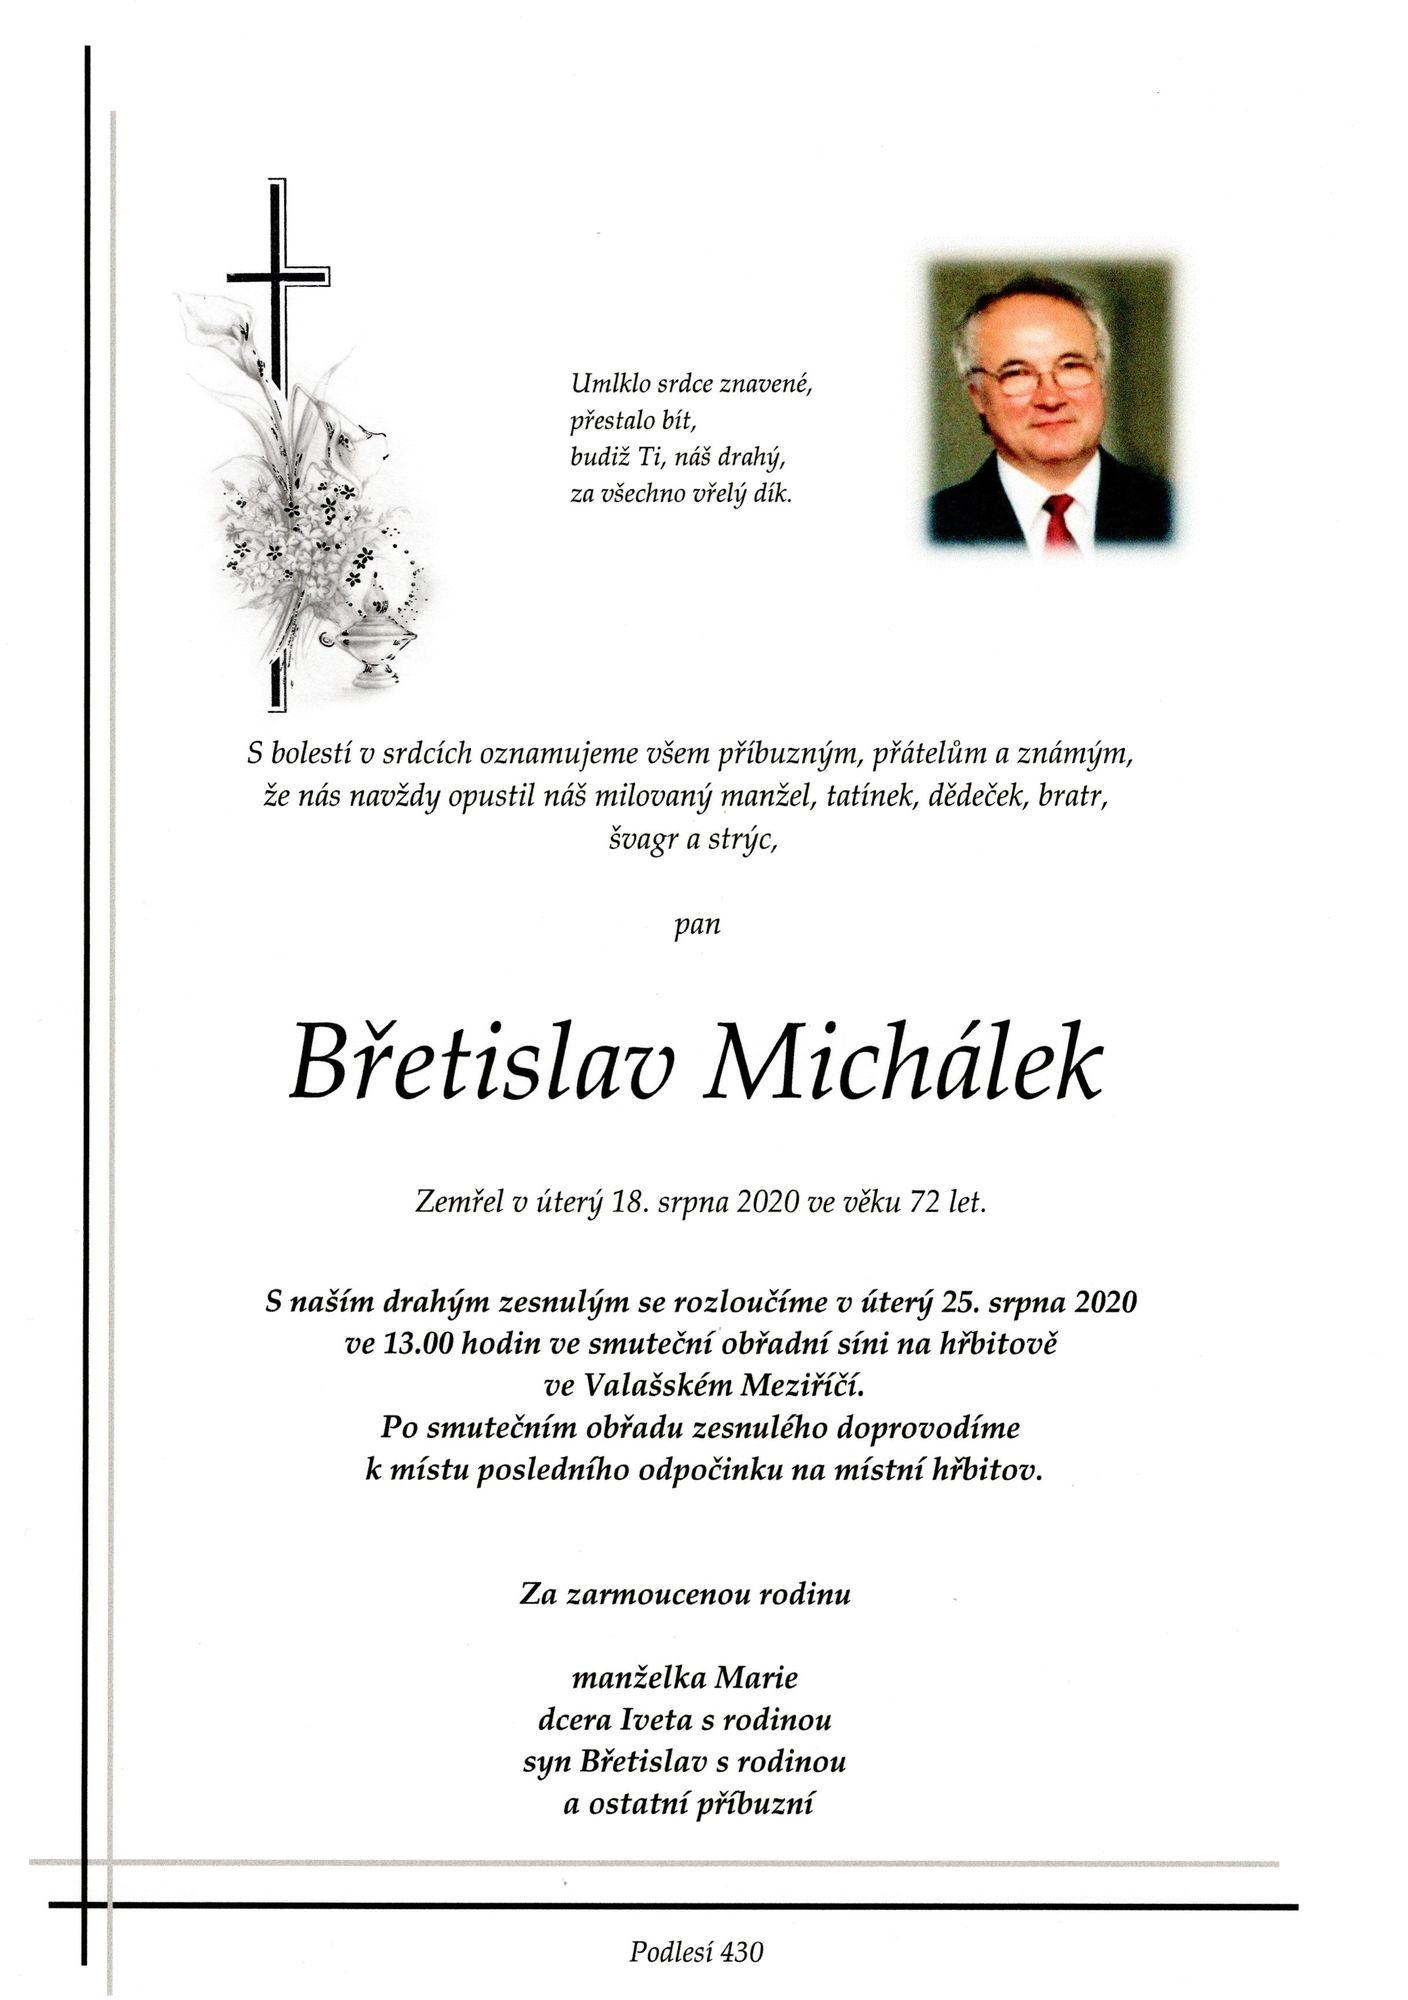 Břetislav Michálek